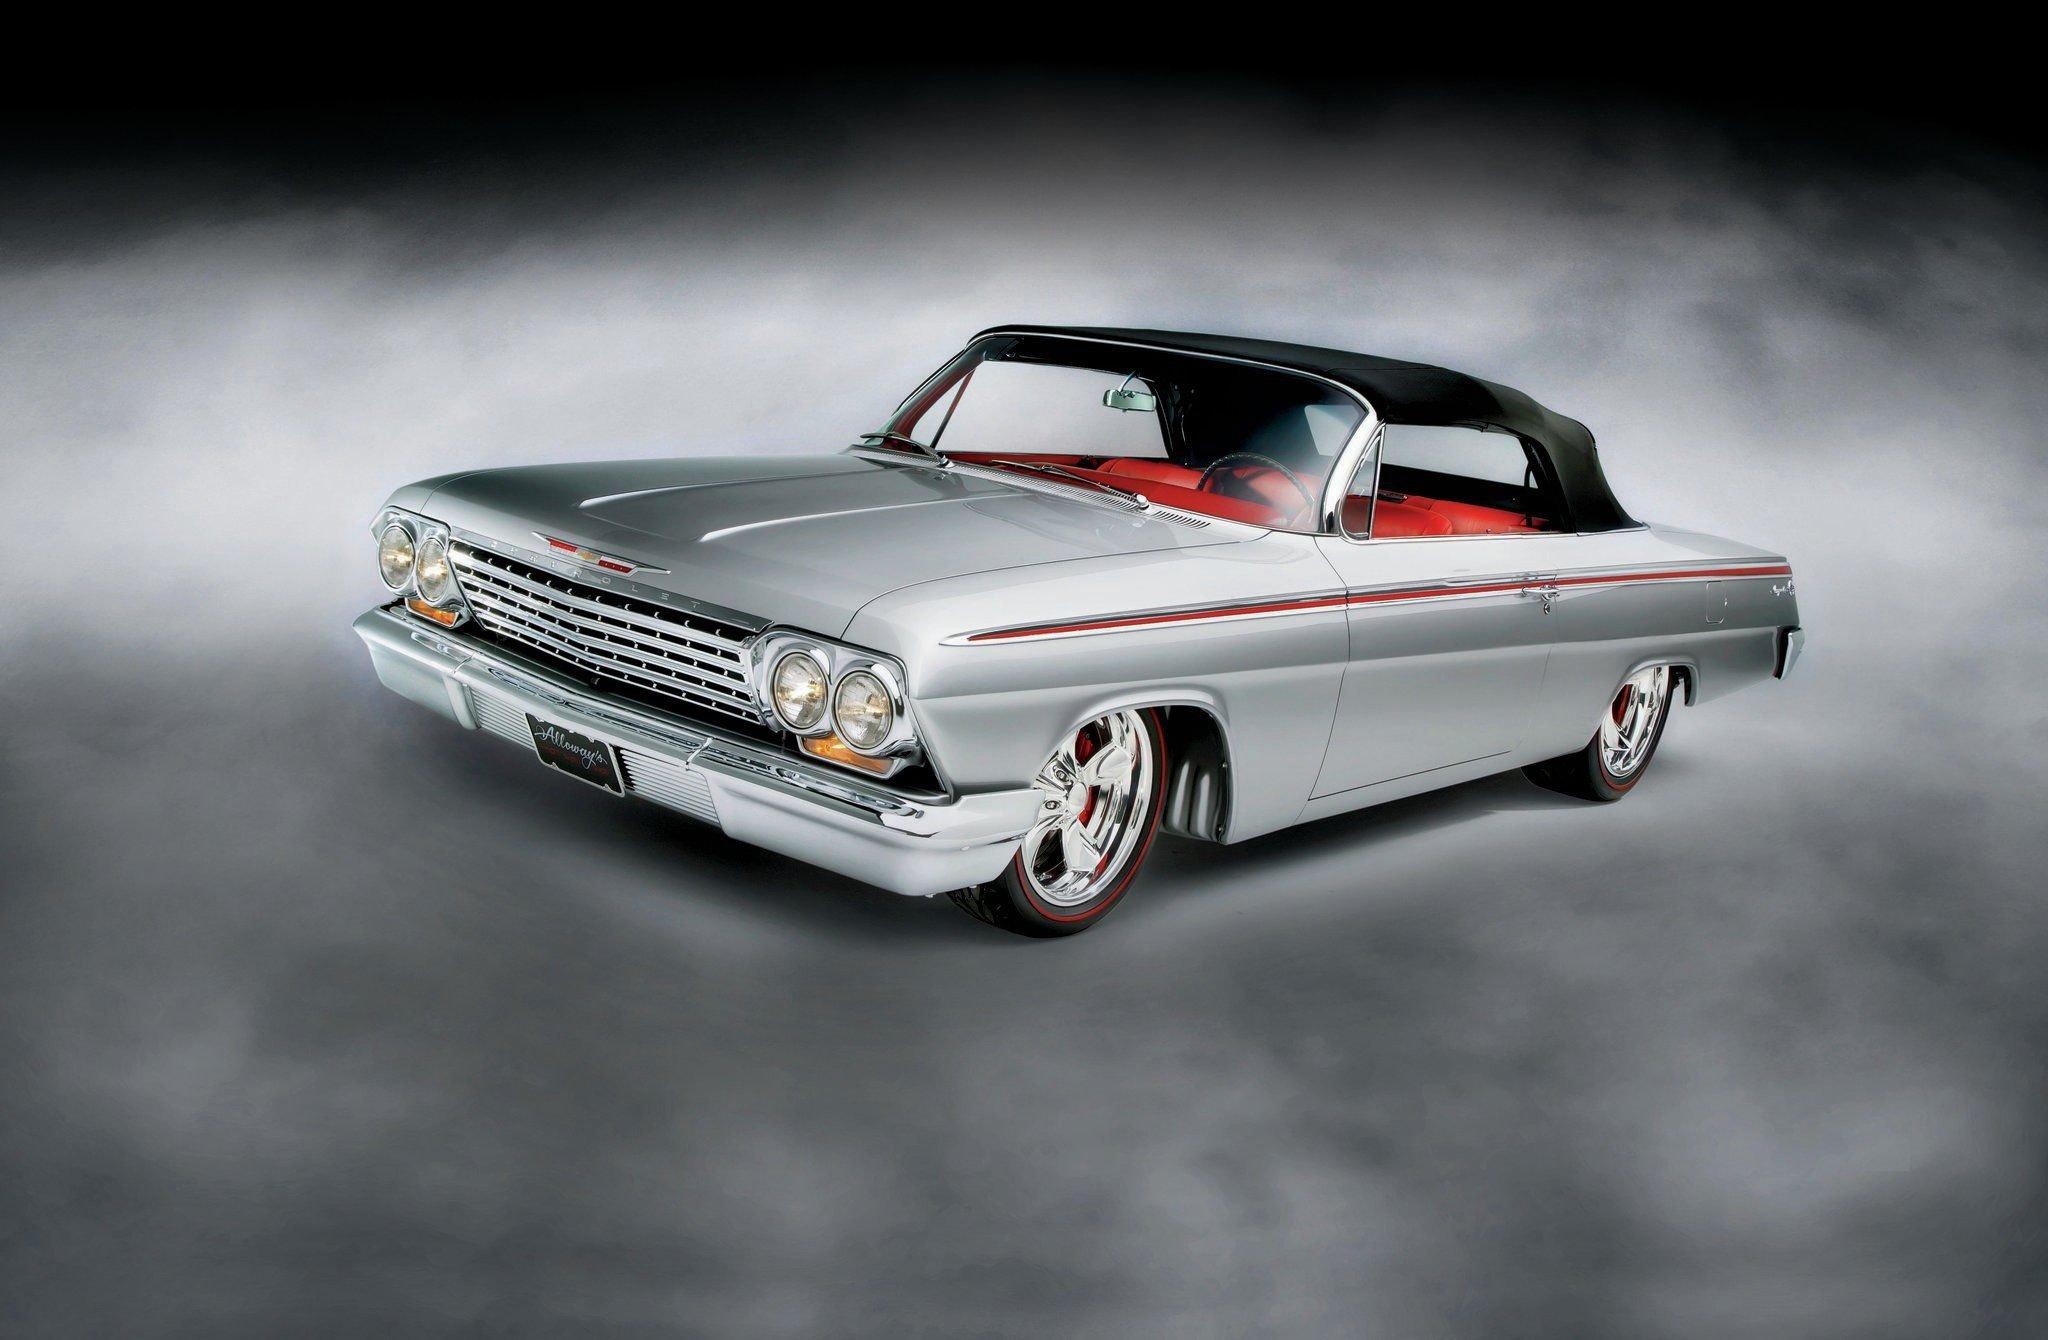 1962 Chevrolet Impala Convertible-01 wallpaper